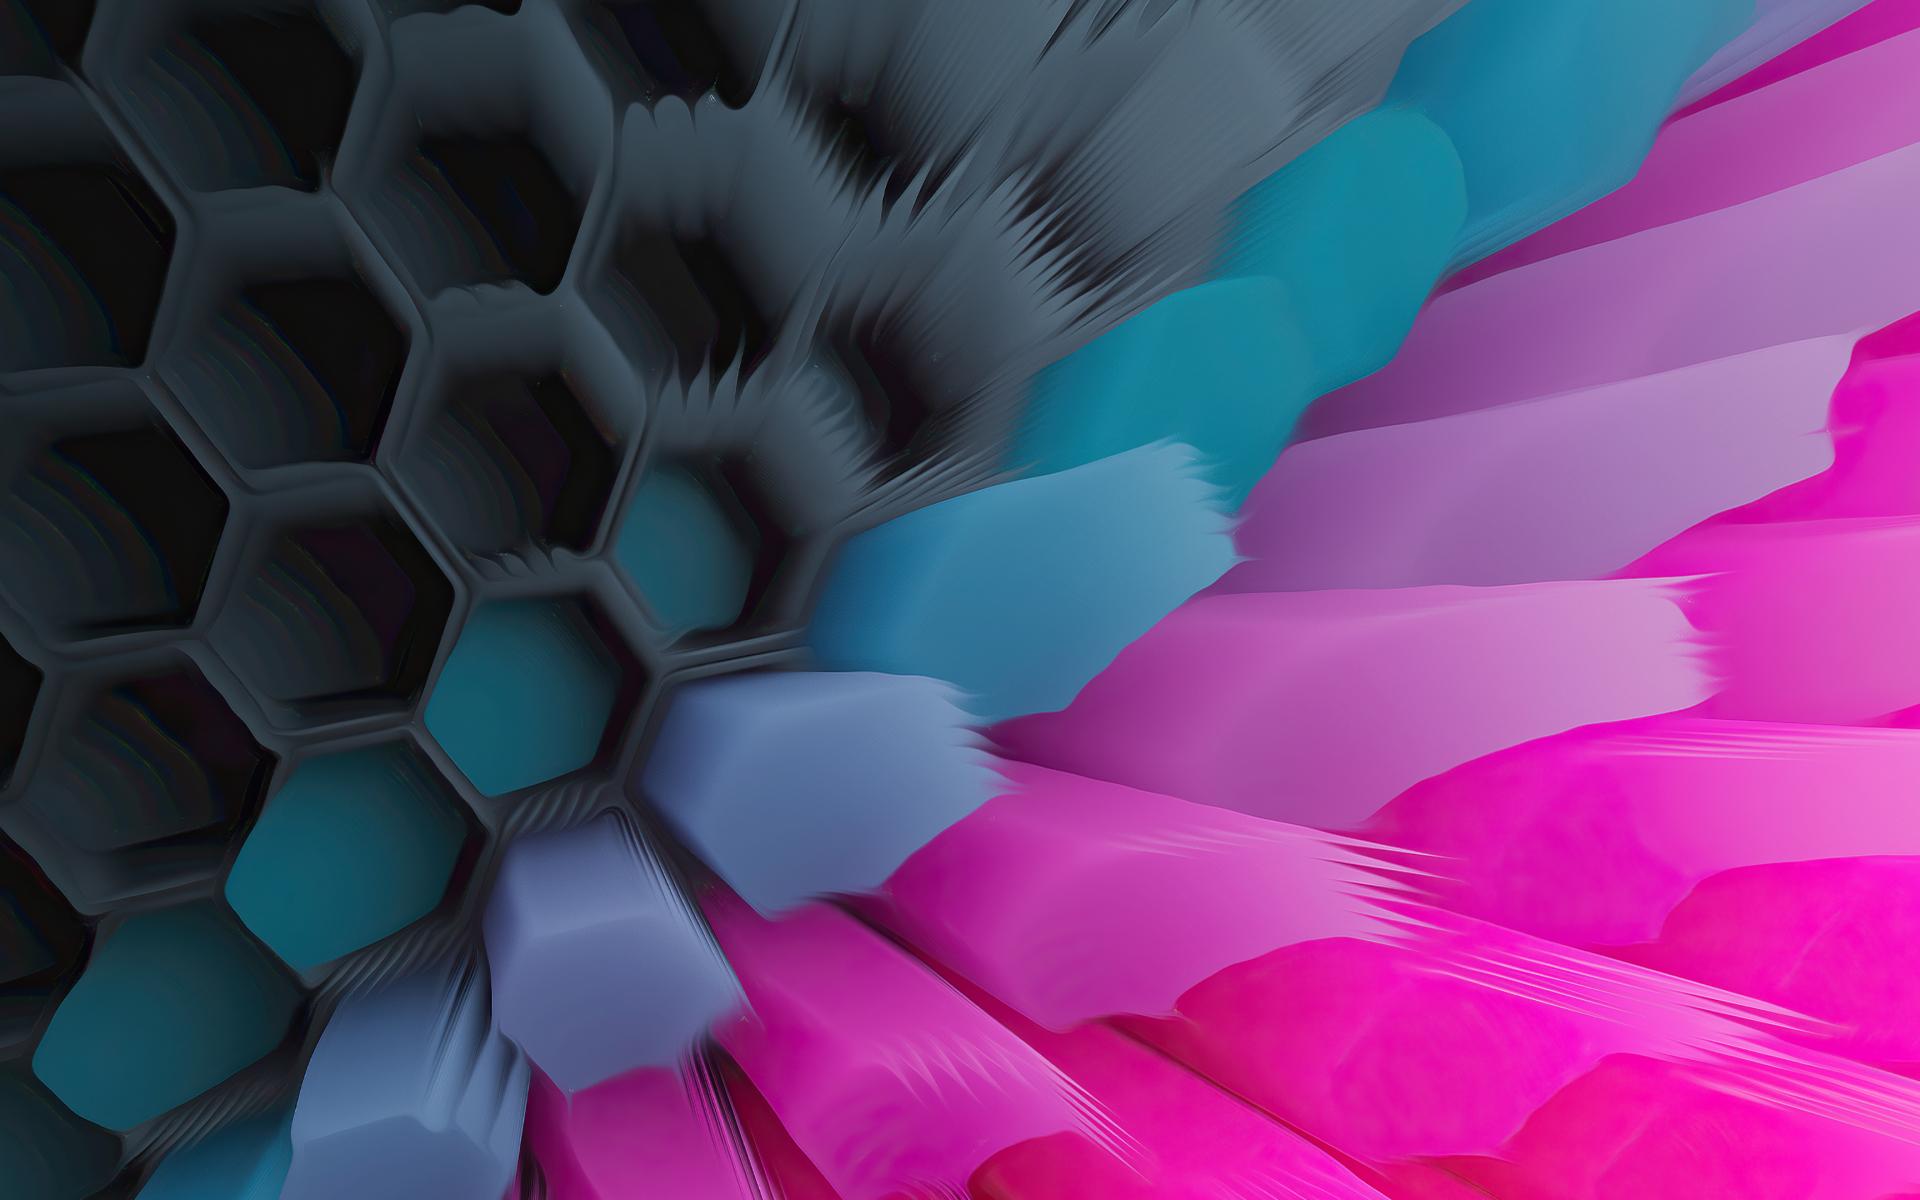 Pink Blue 4K Hexagon Wallpaper in 1920x1200 Resolution